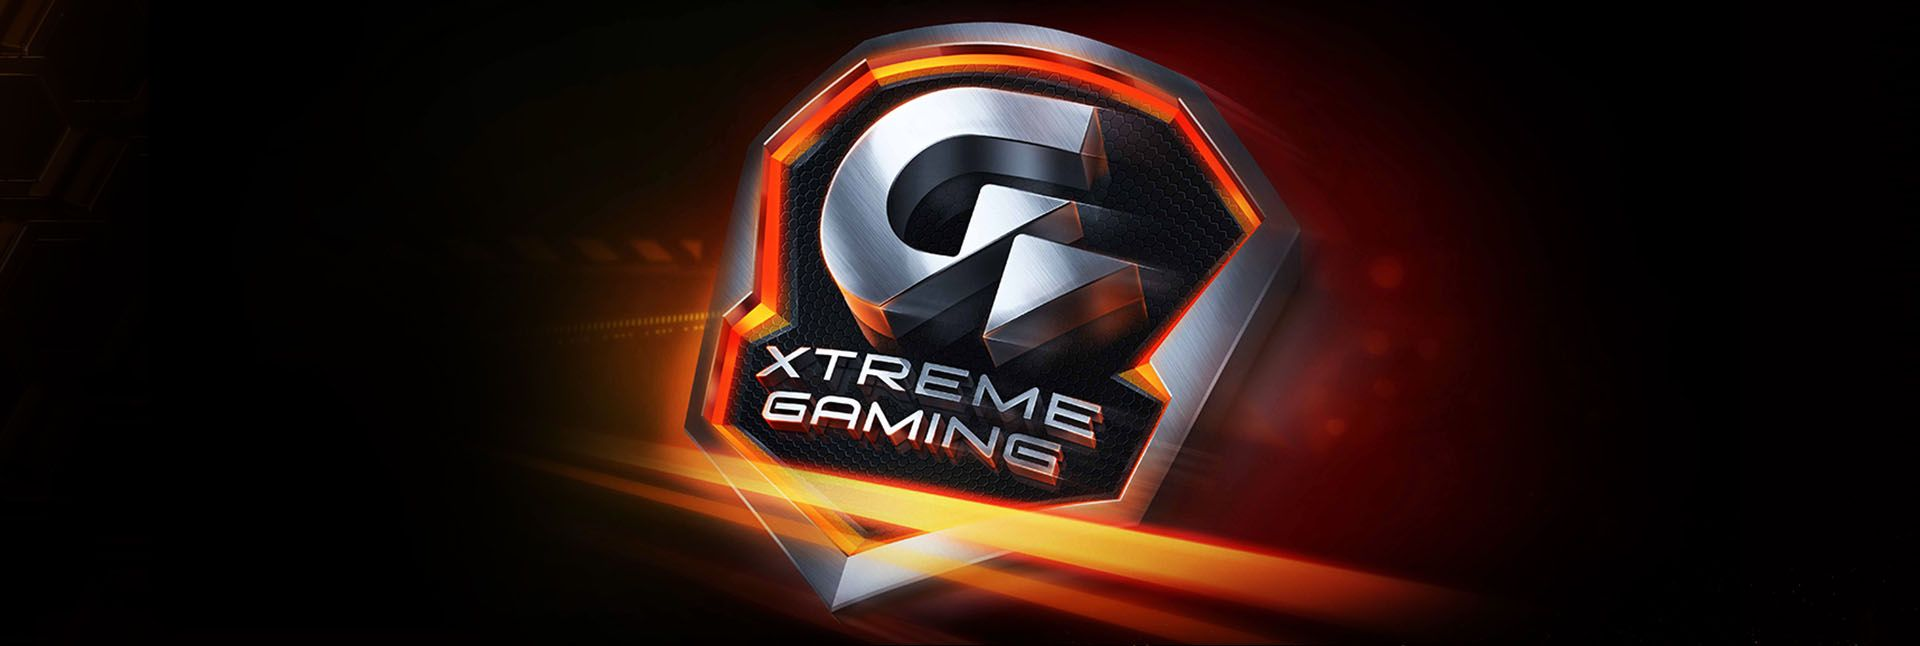 Gigabyte Gaming Wallpapers 2560x1440